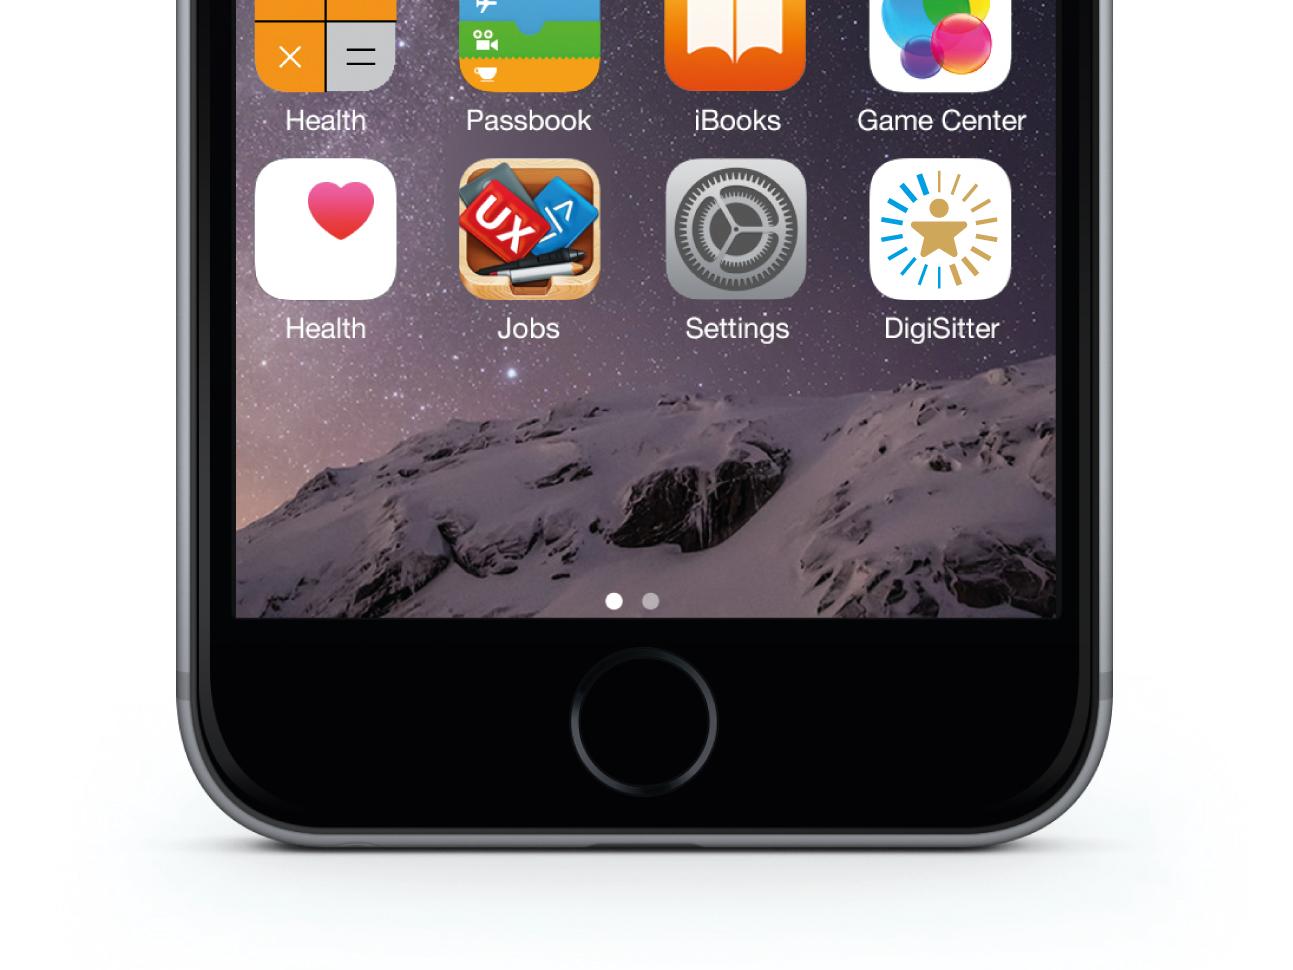 martin_zech_design_projekt_design_digisitter_app-icon